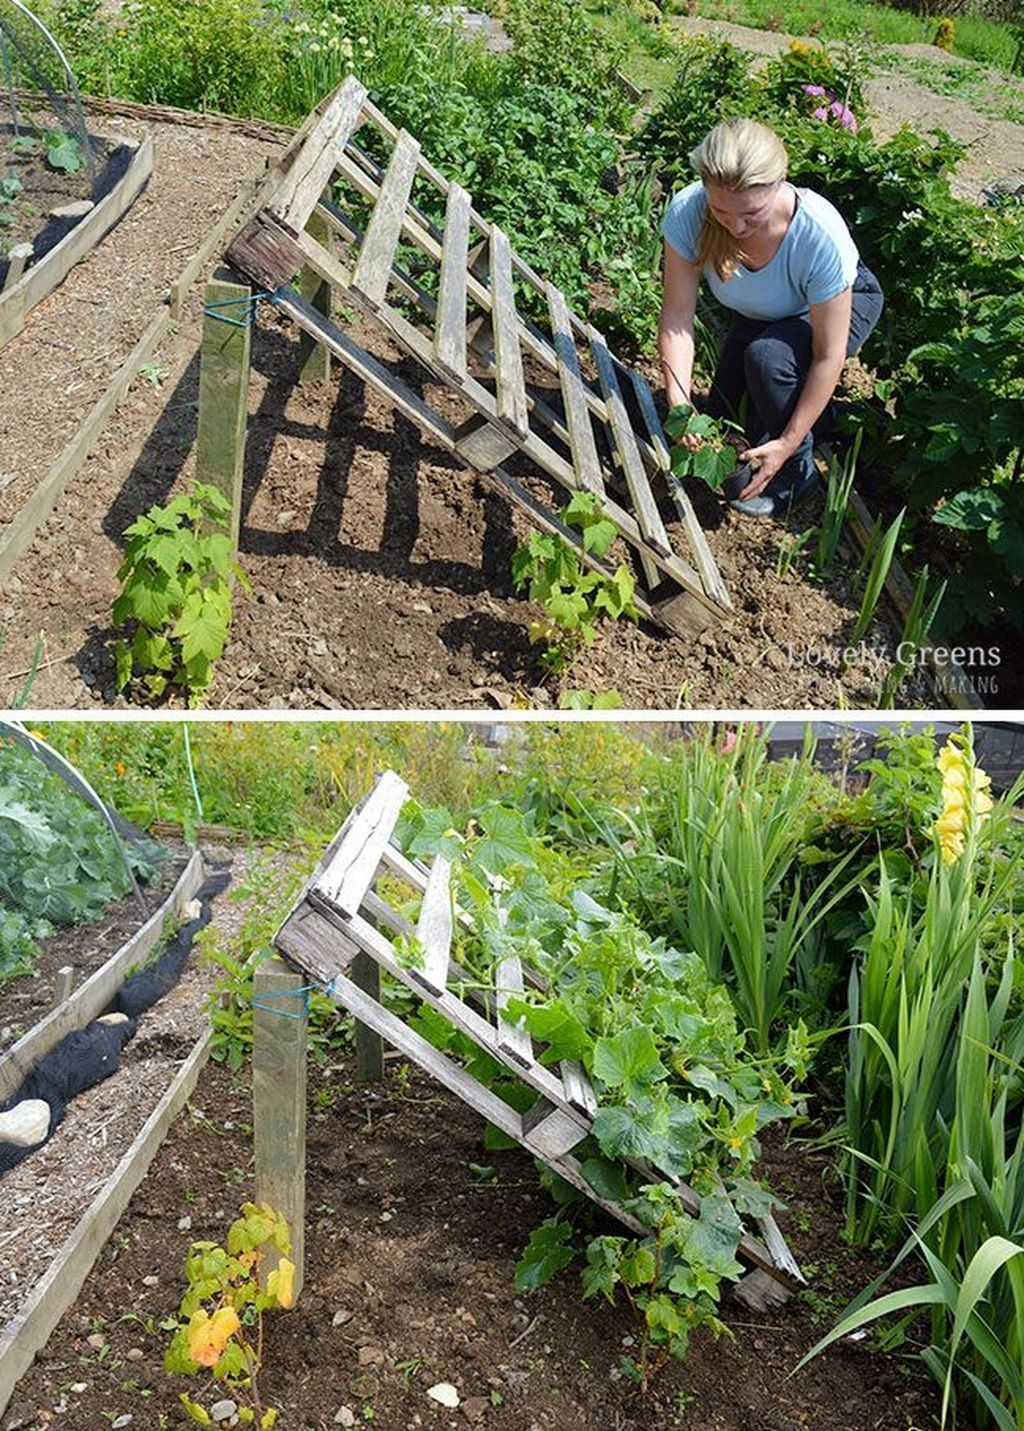 42 brilliant gardening ideas to inspire you cucumber